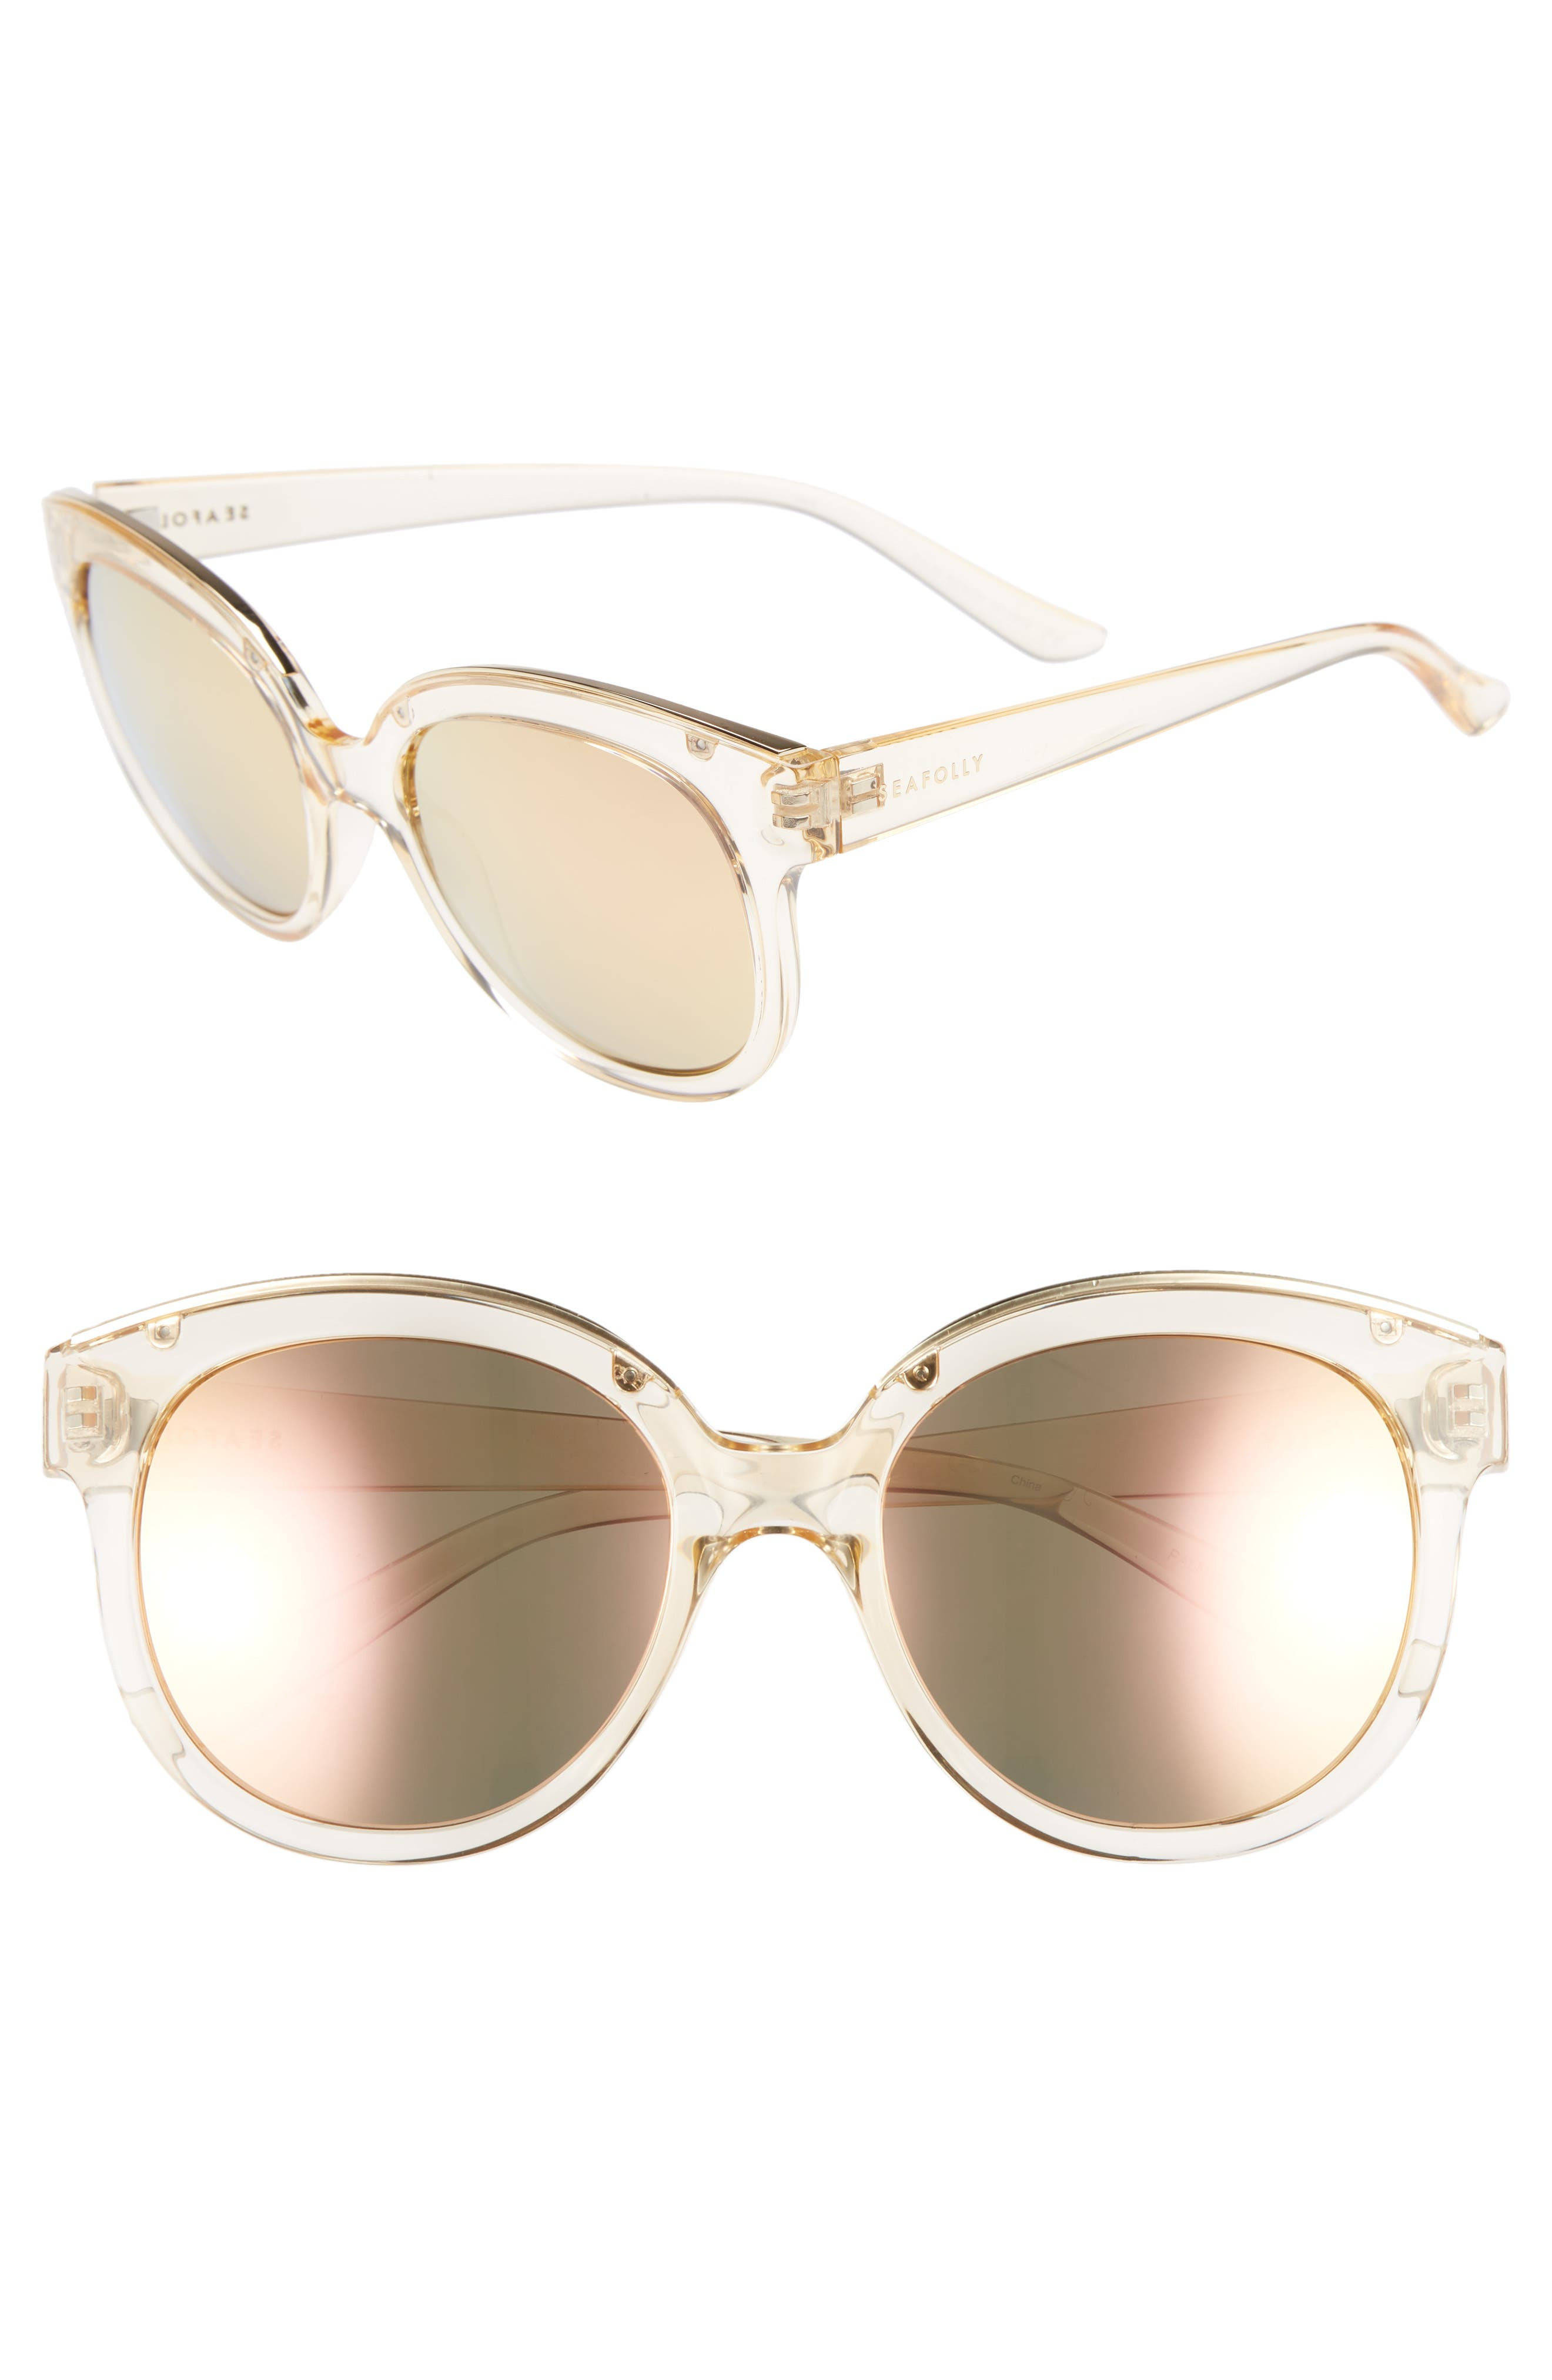 Palm Beach 54mm Cat Eye Sunglasses,                         Main,                         color, Sand